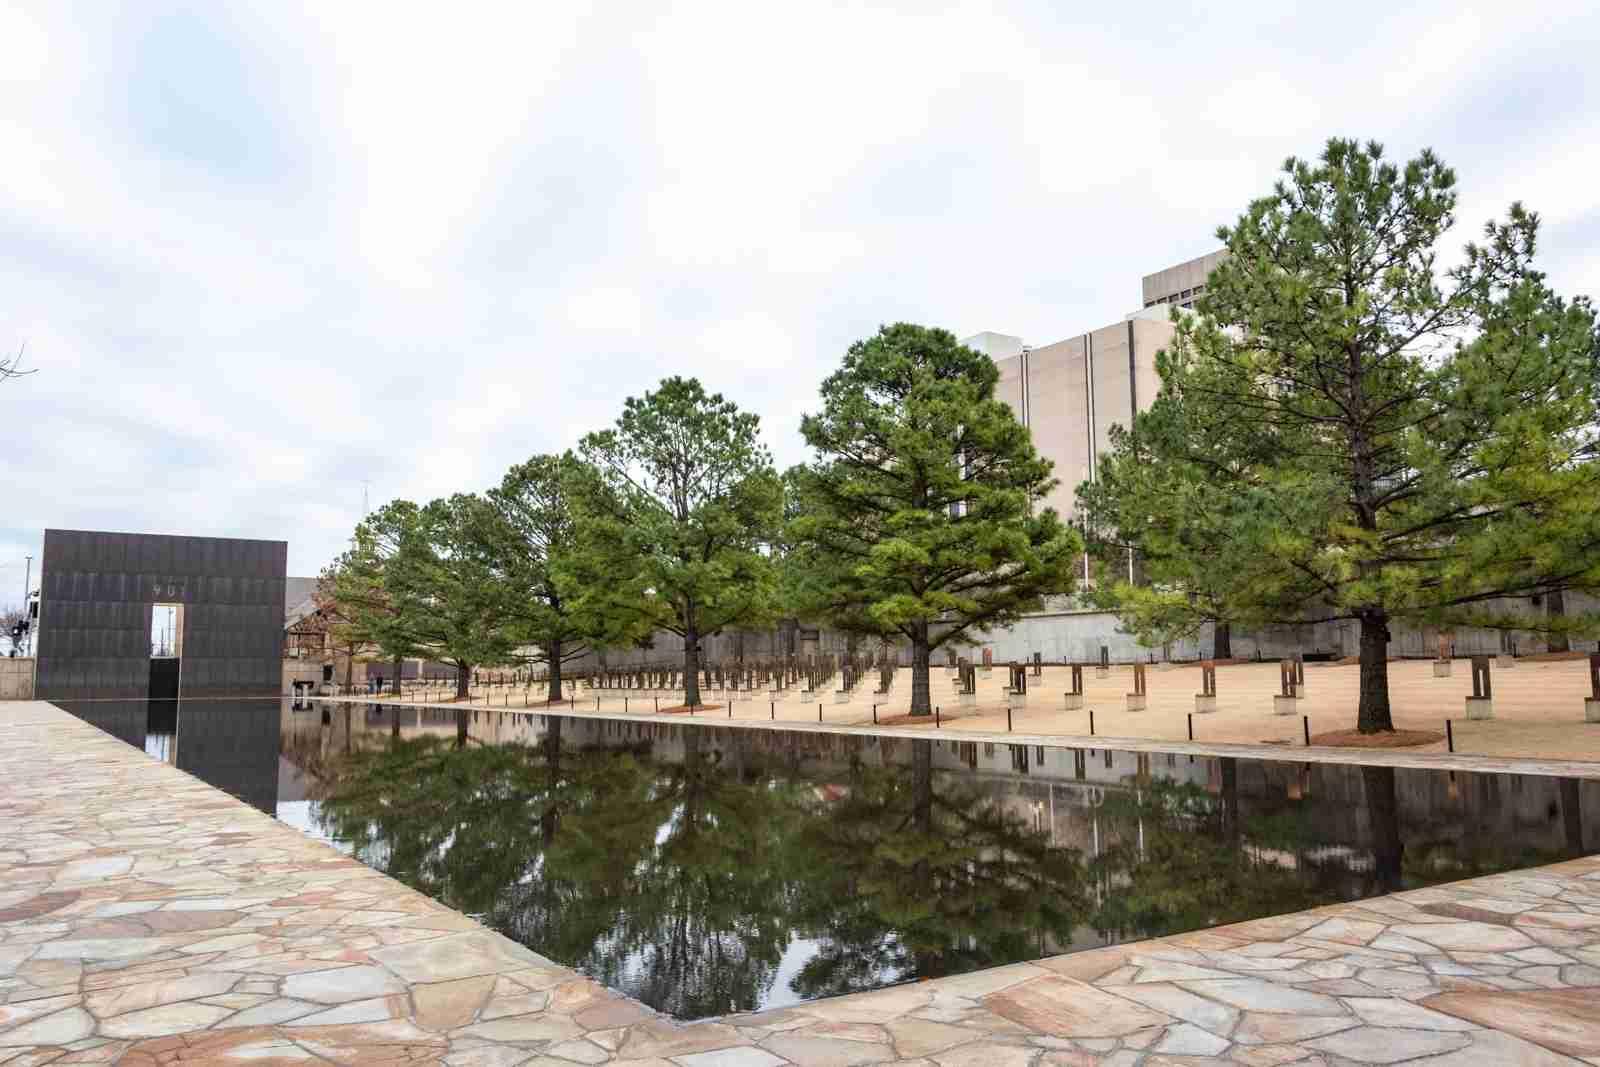 The Oklahoma City National Memorial. (Photo via Shutterstock)